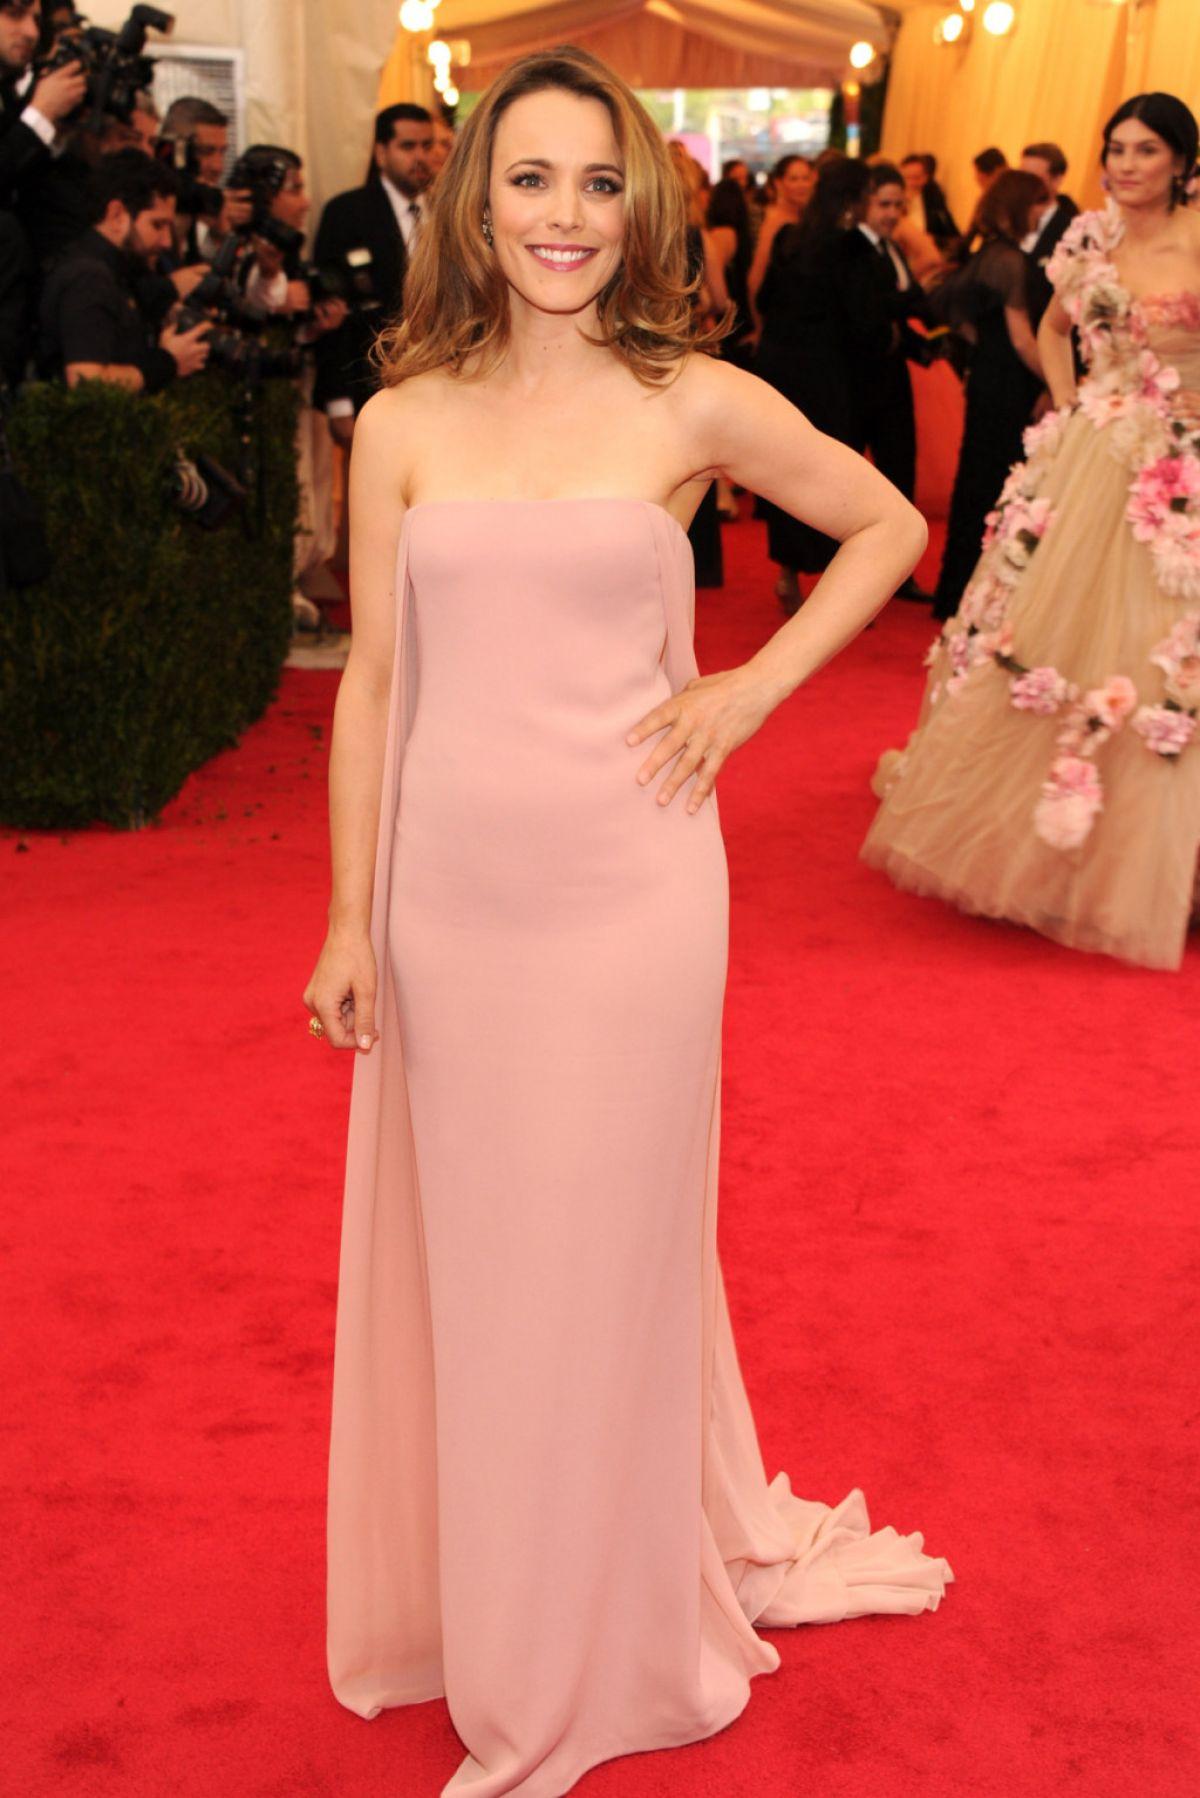 Rachel Mcadams At Met Gala 2014 In New York Hawtcelebs